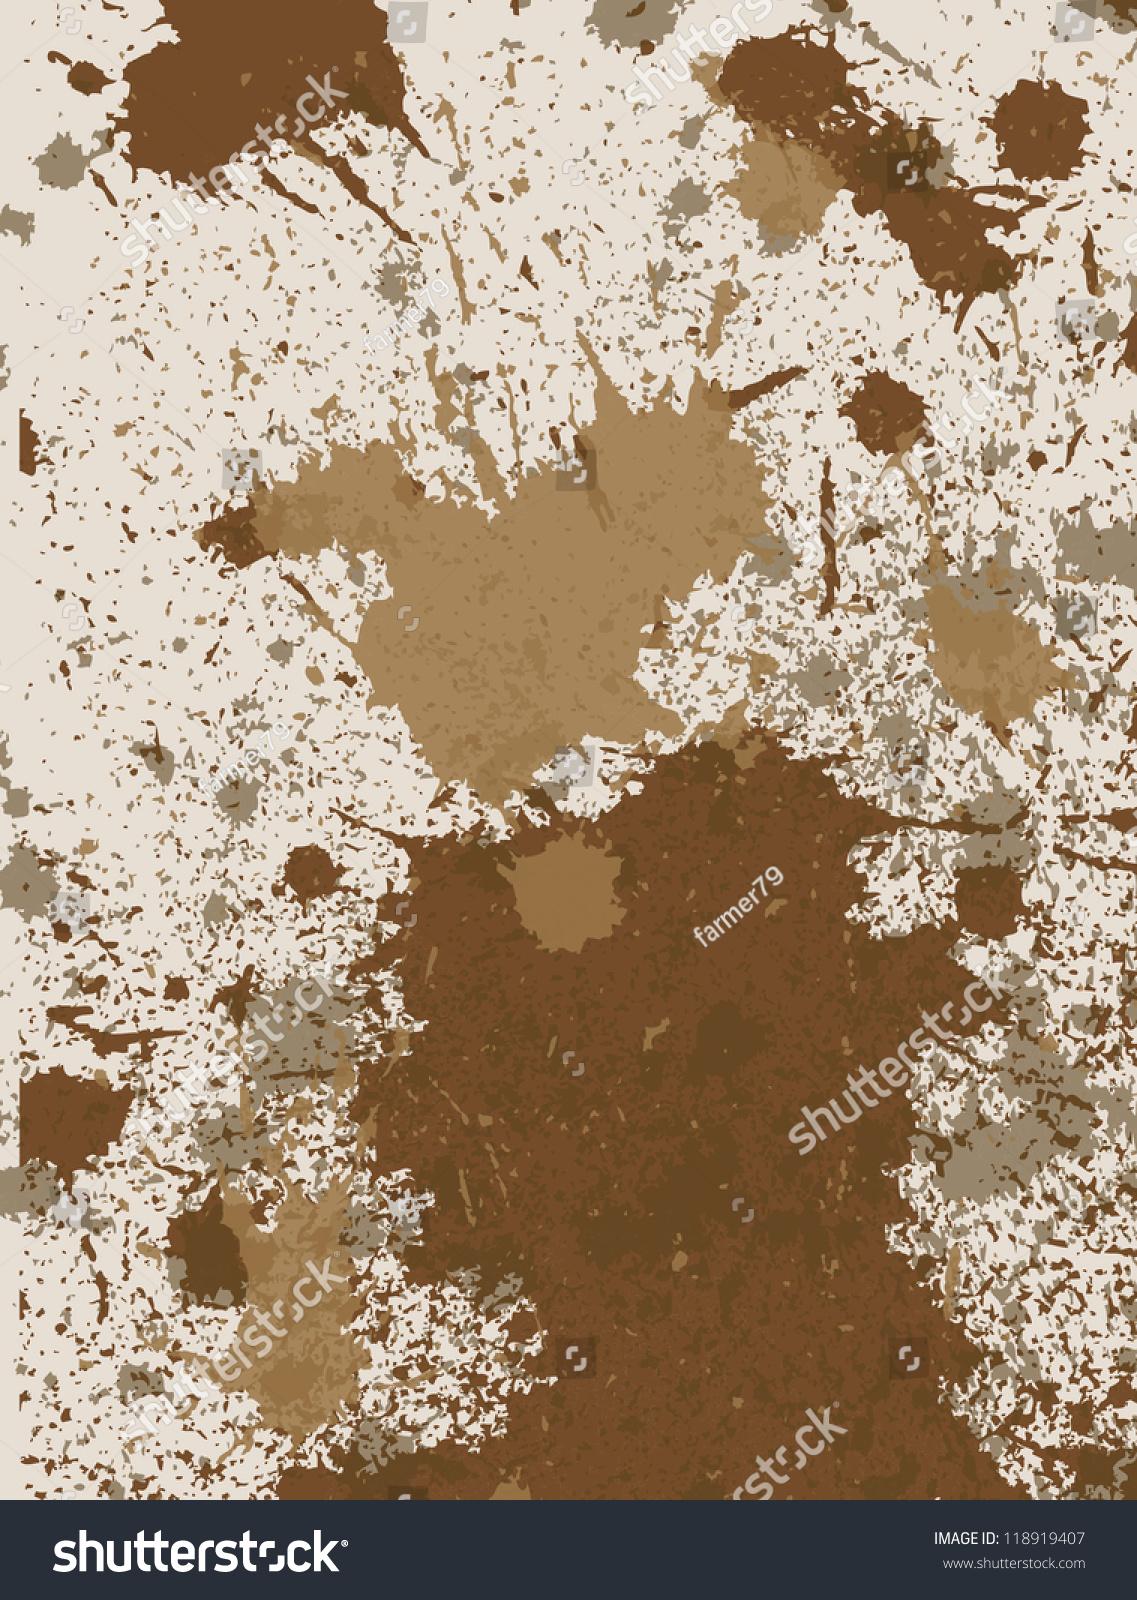 Mud splatter texture vector